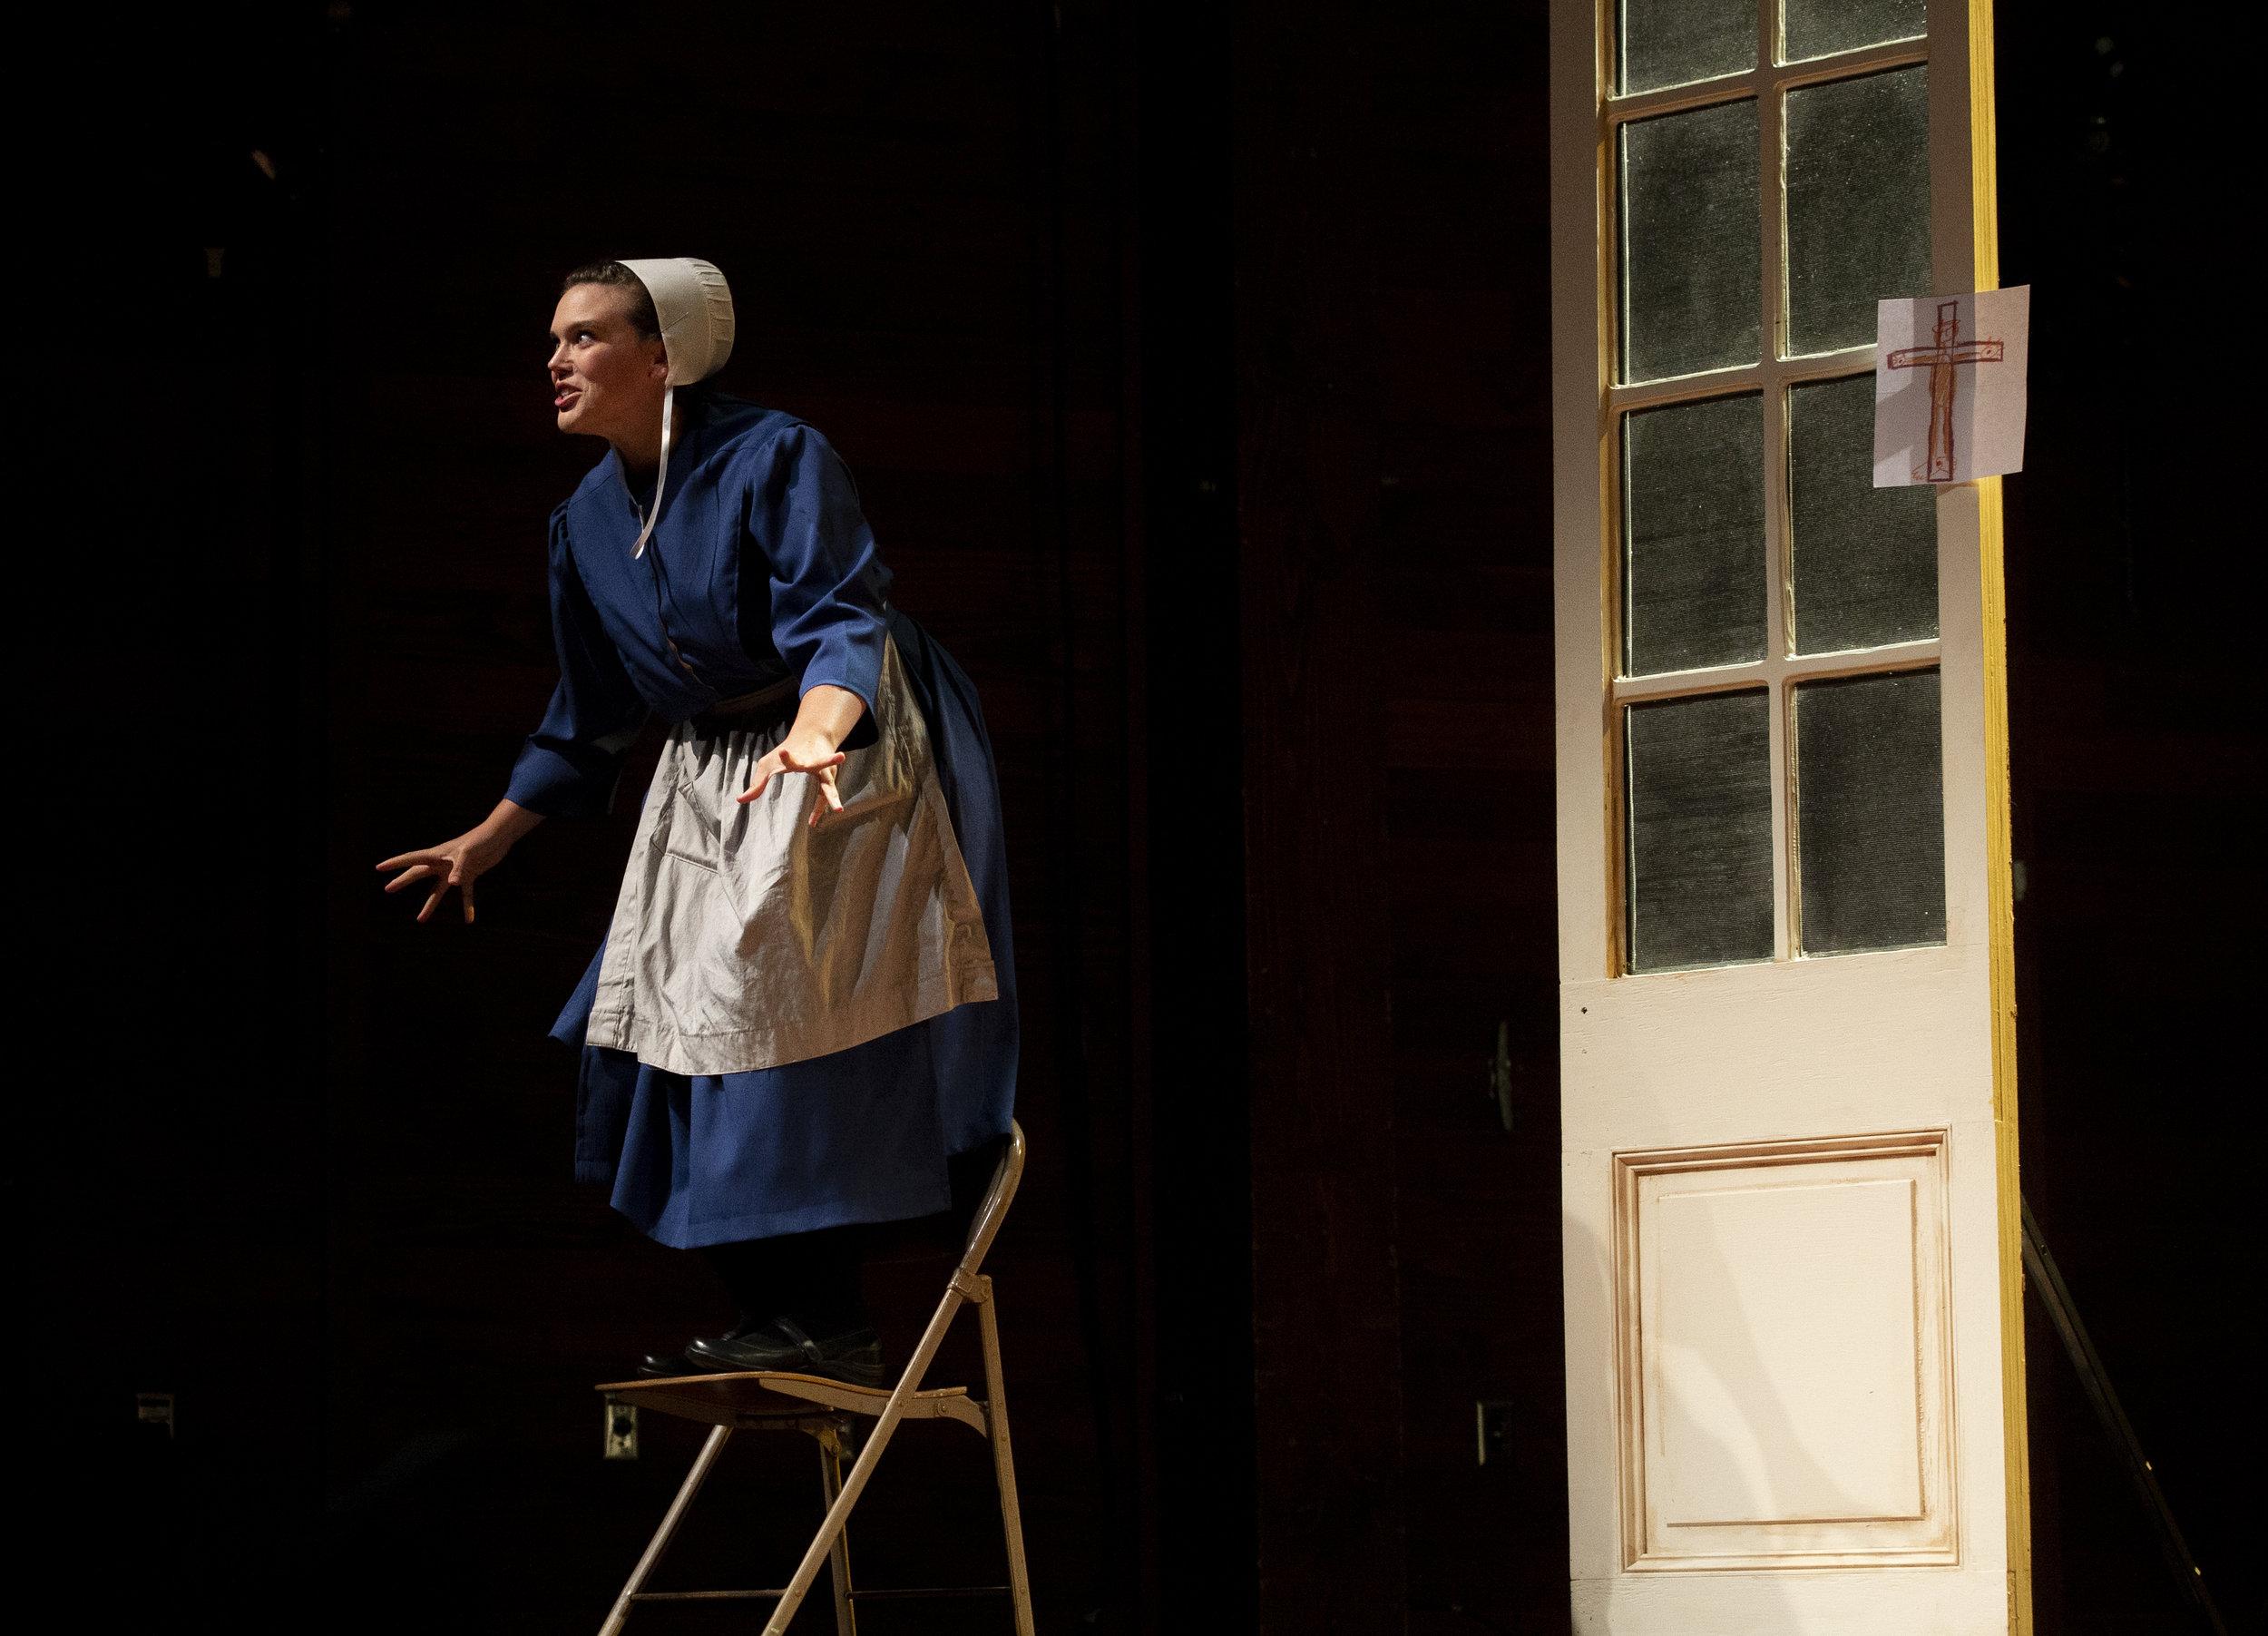 082018_AmishProject_DM_16.jpg